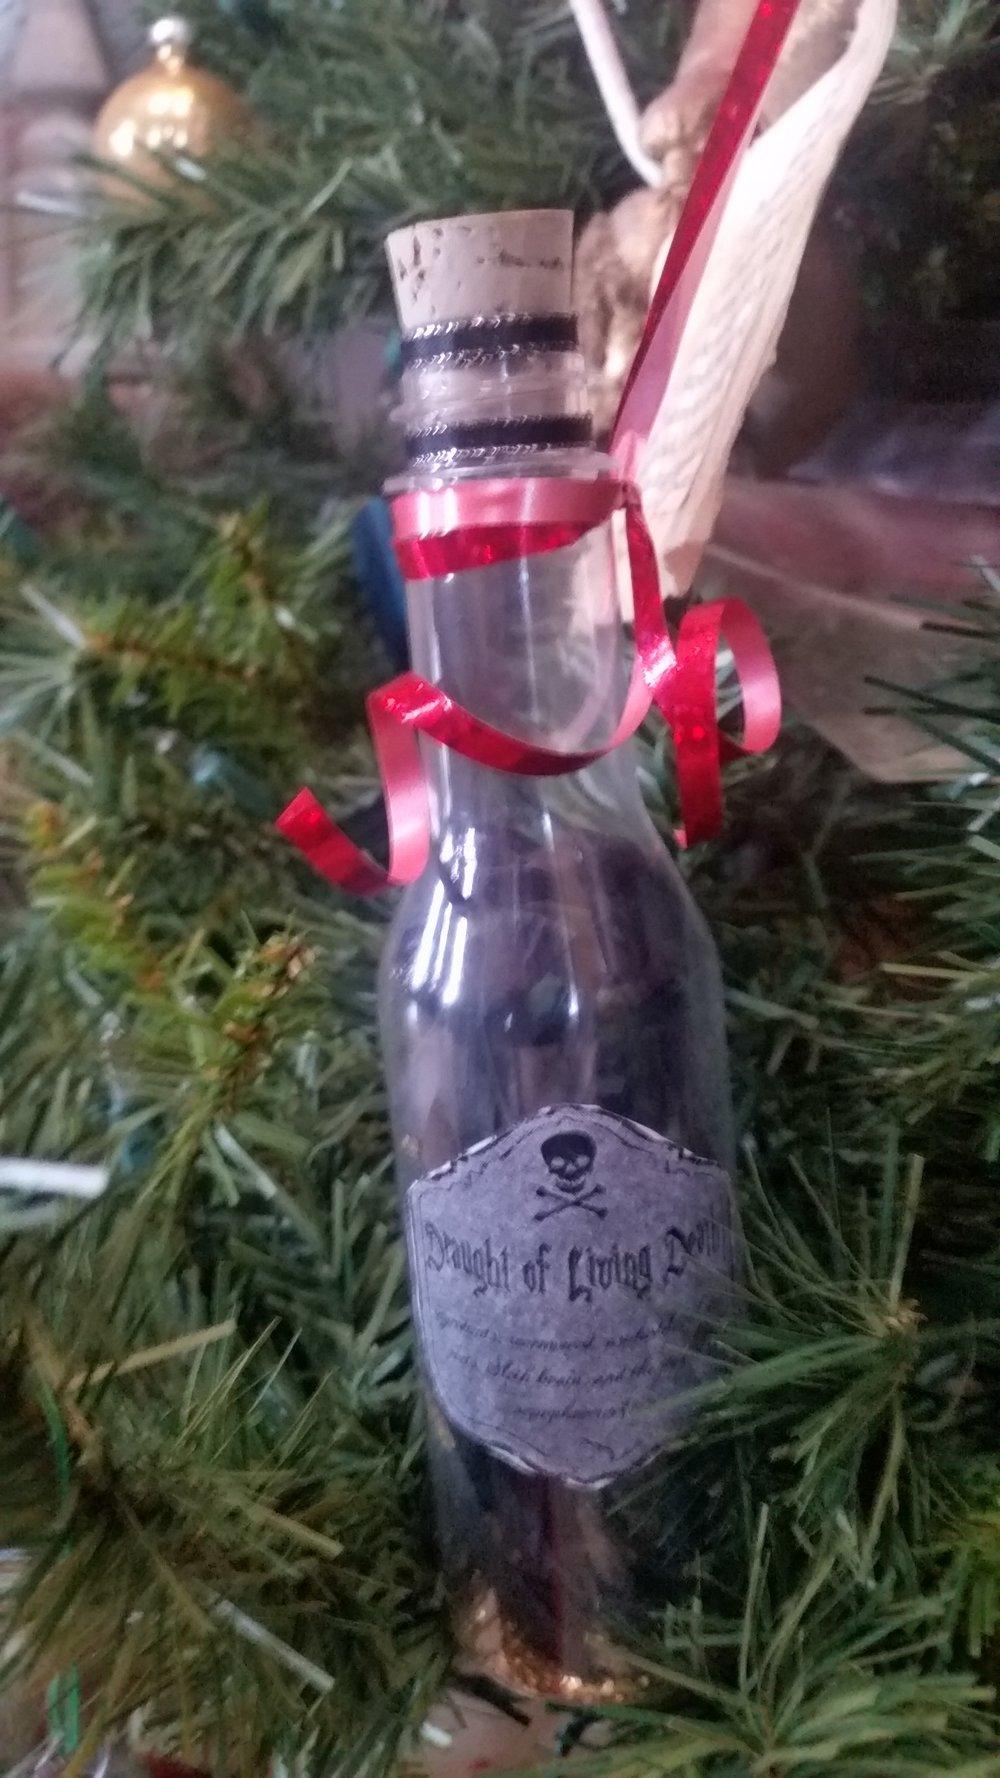 potions-bottle.jpg